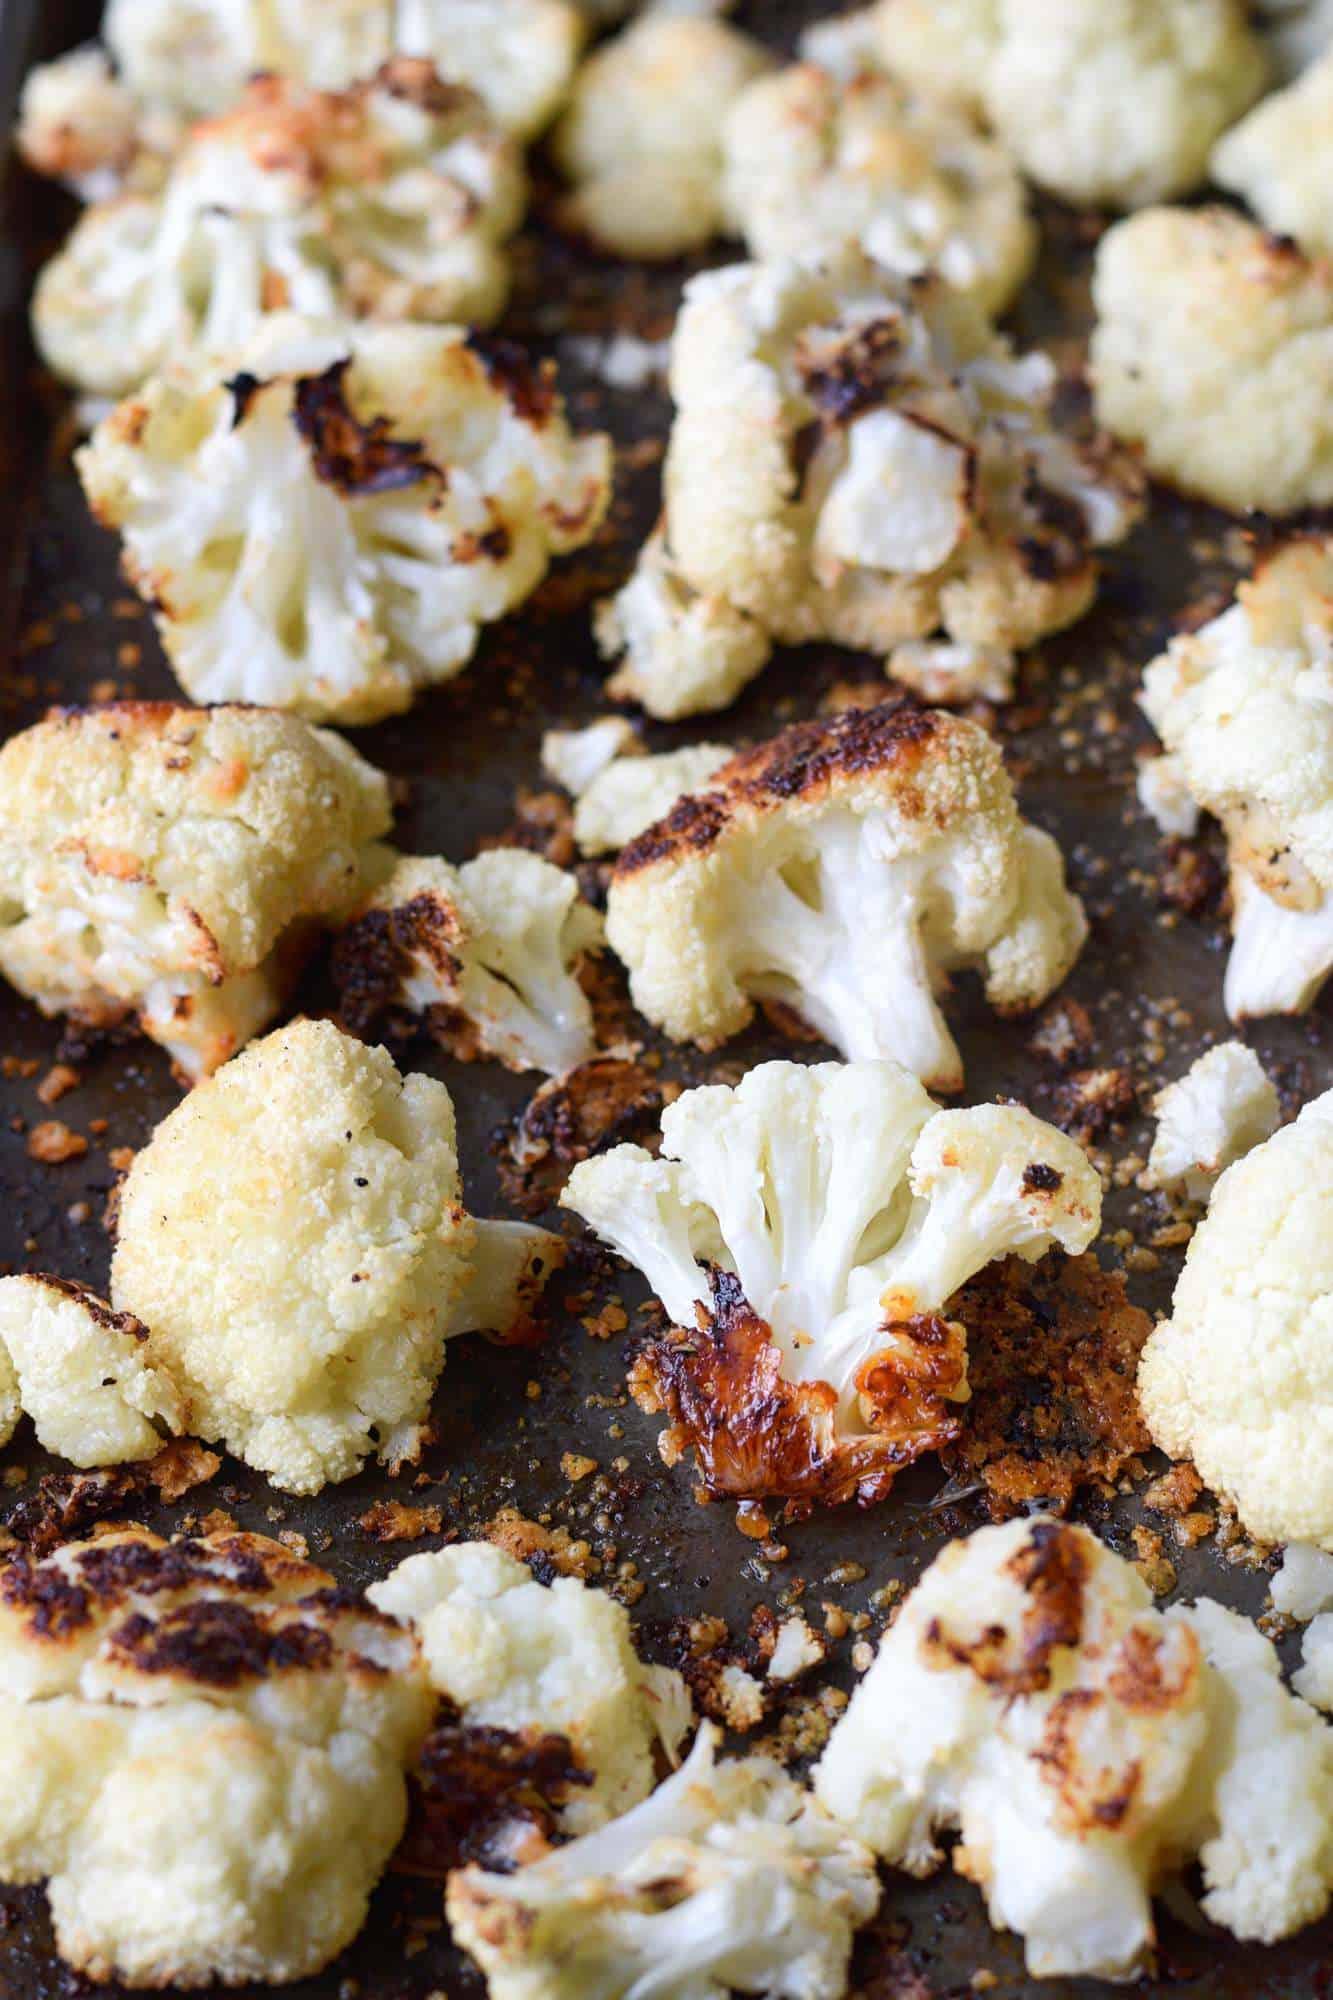 A baking sheet full of roasted cauliflower.